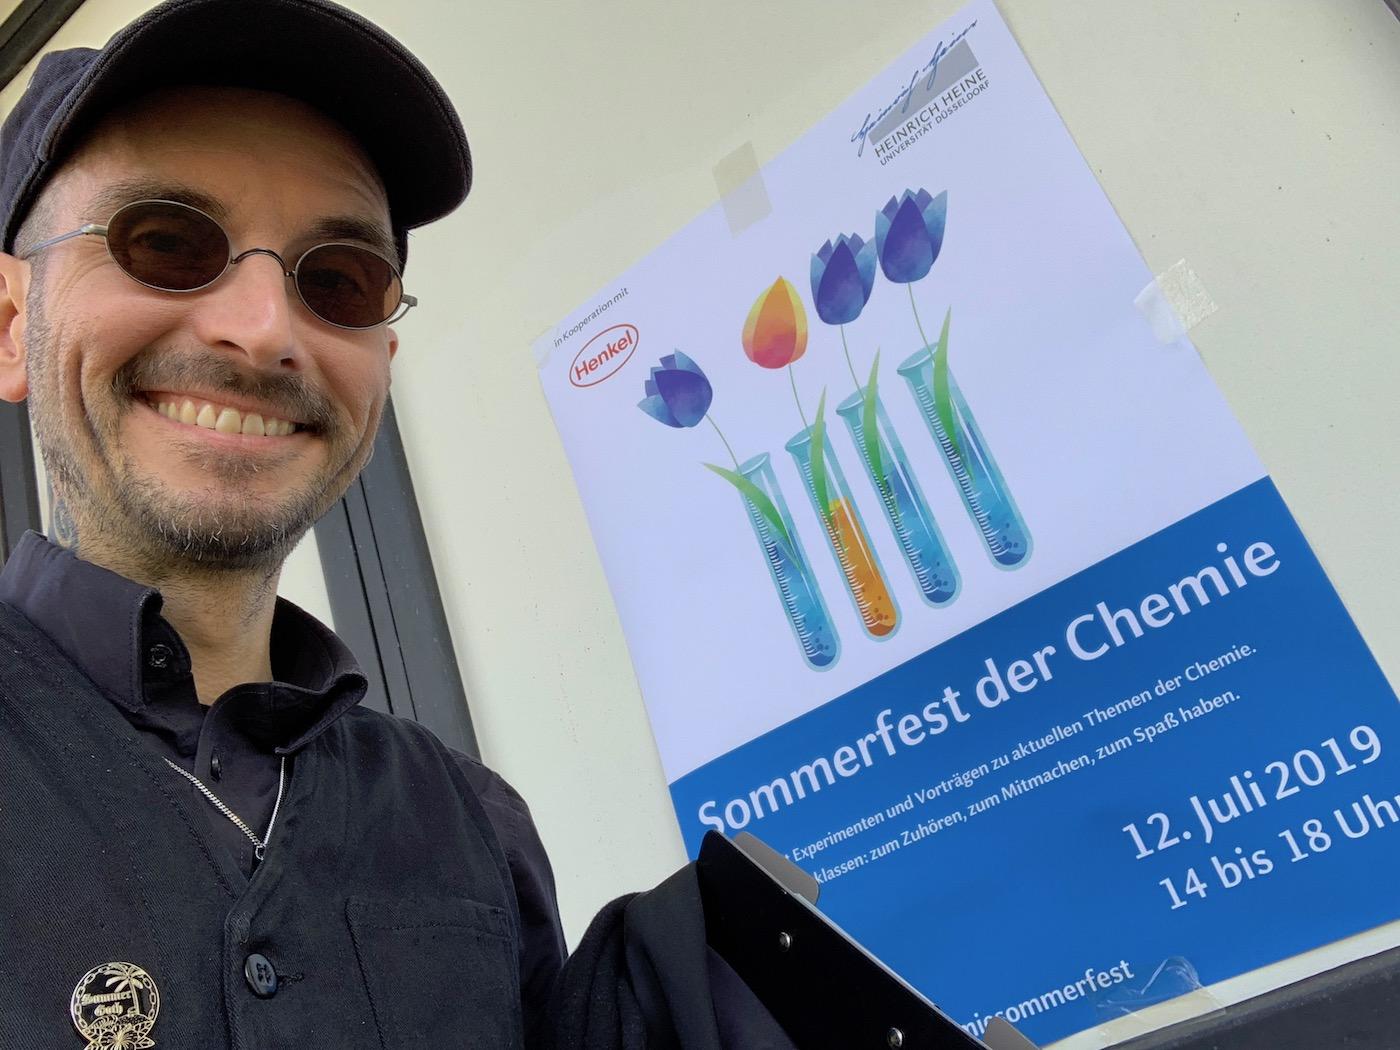 mark_benecke_igem_duesseldorf_2018_2019_molecular_synthetic_biology - 34.jpg